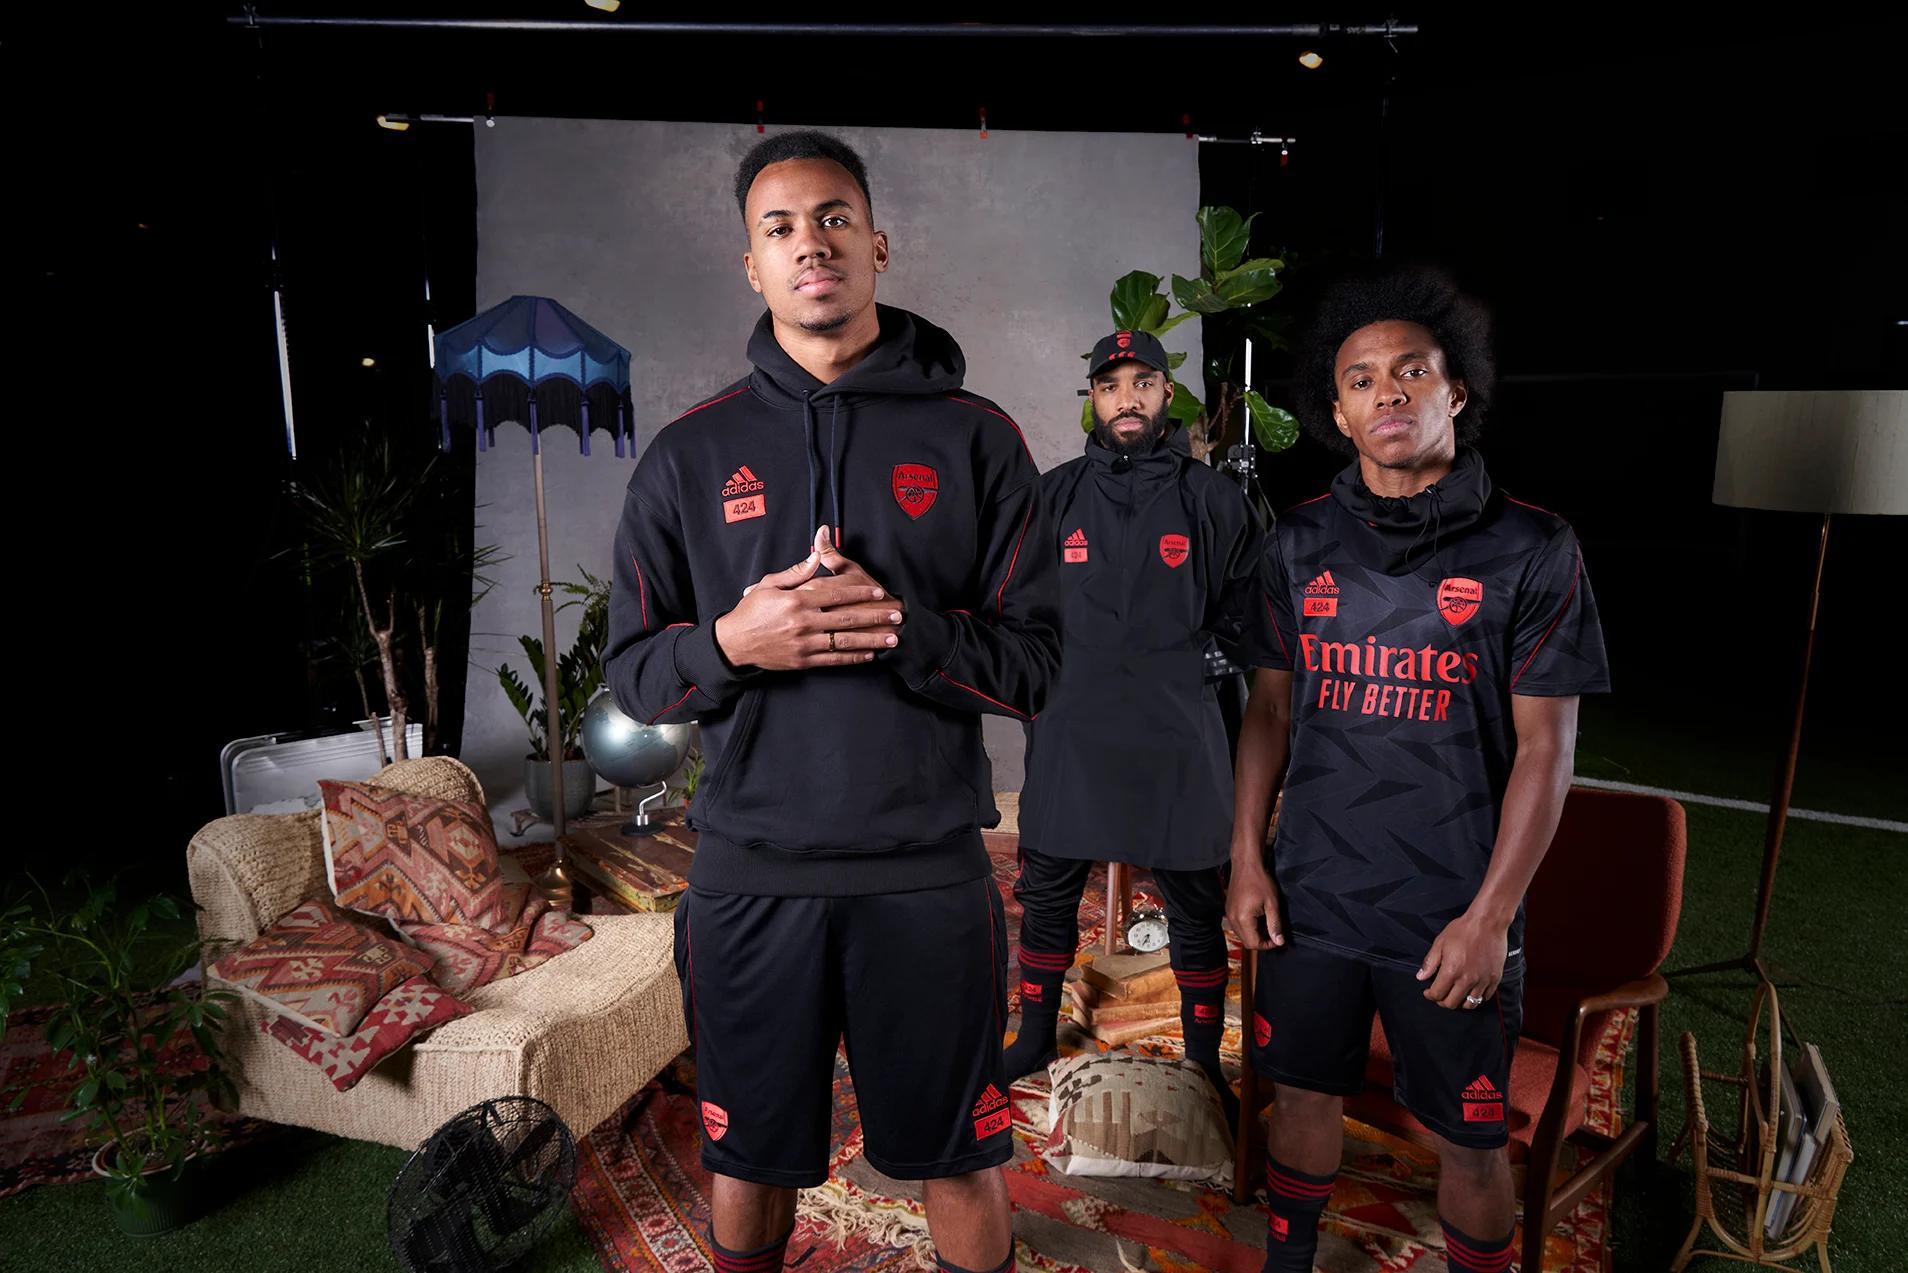 https www standard co uk sport football arsenal adidas new training kit launch 424 collection b923175 html